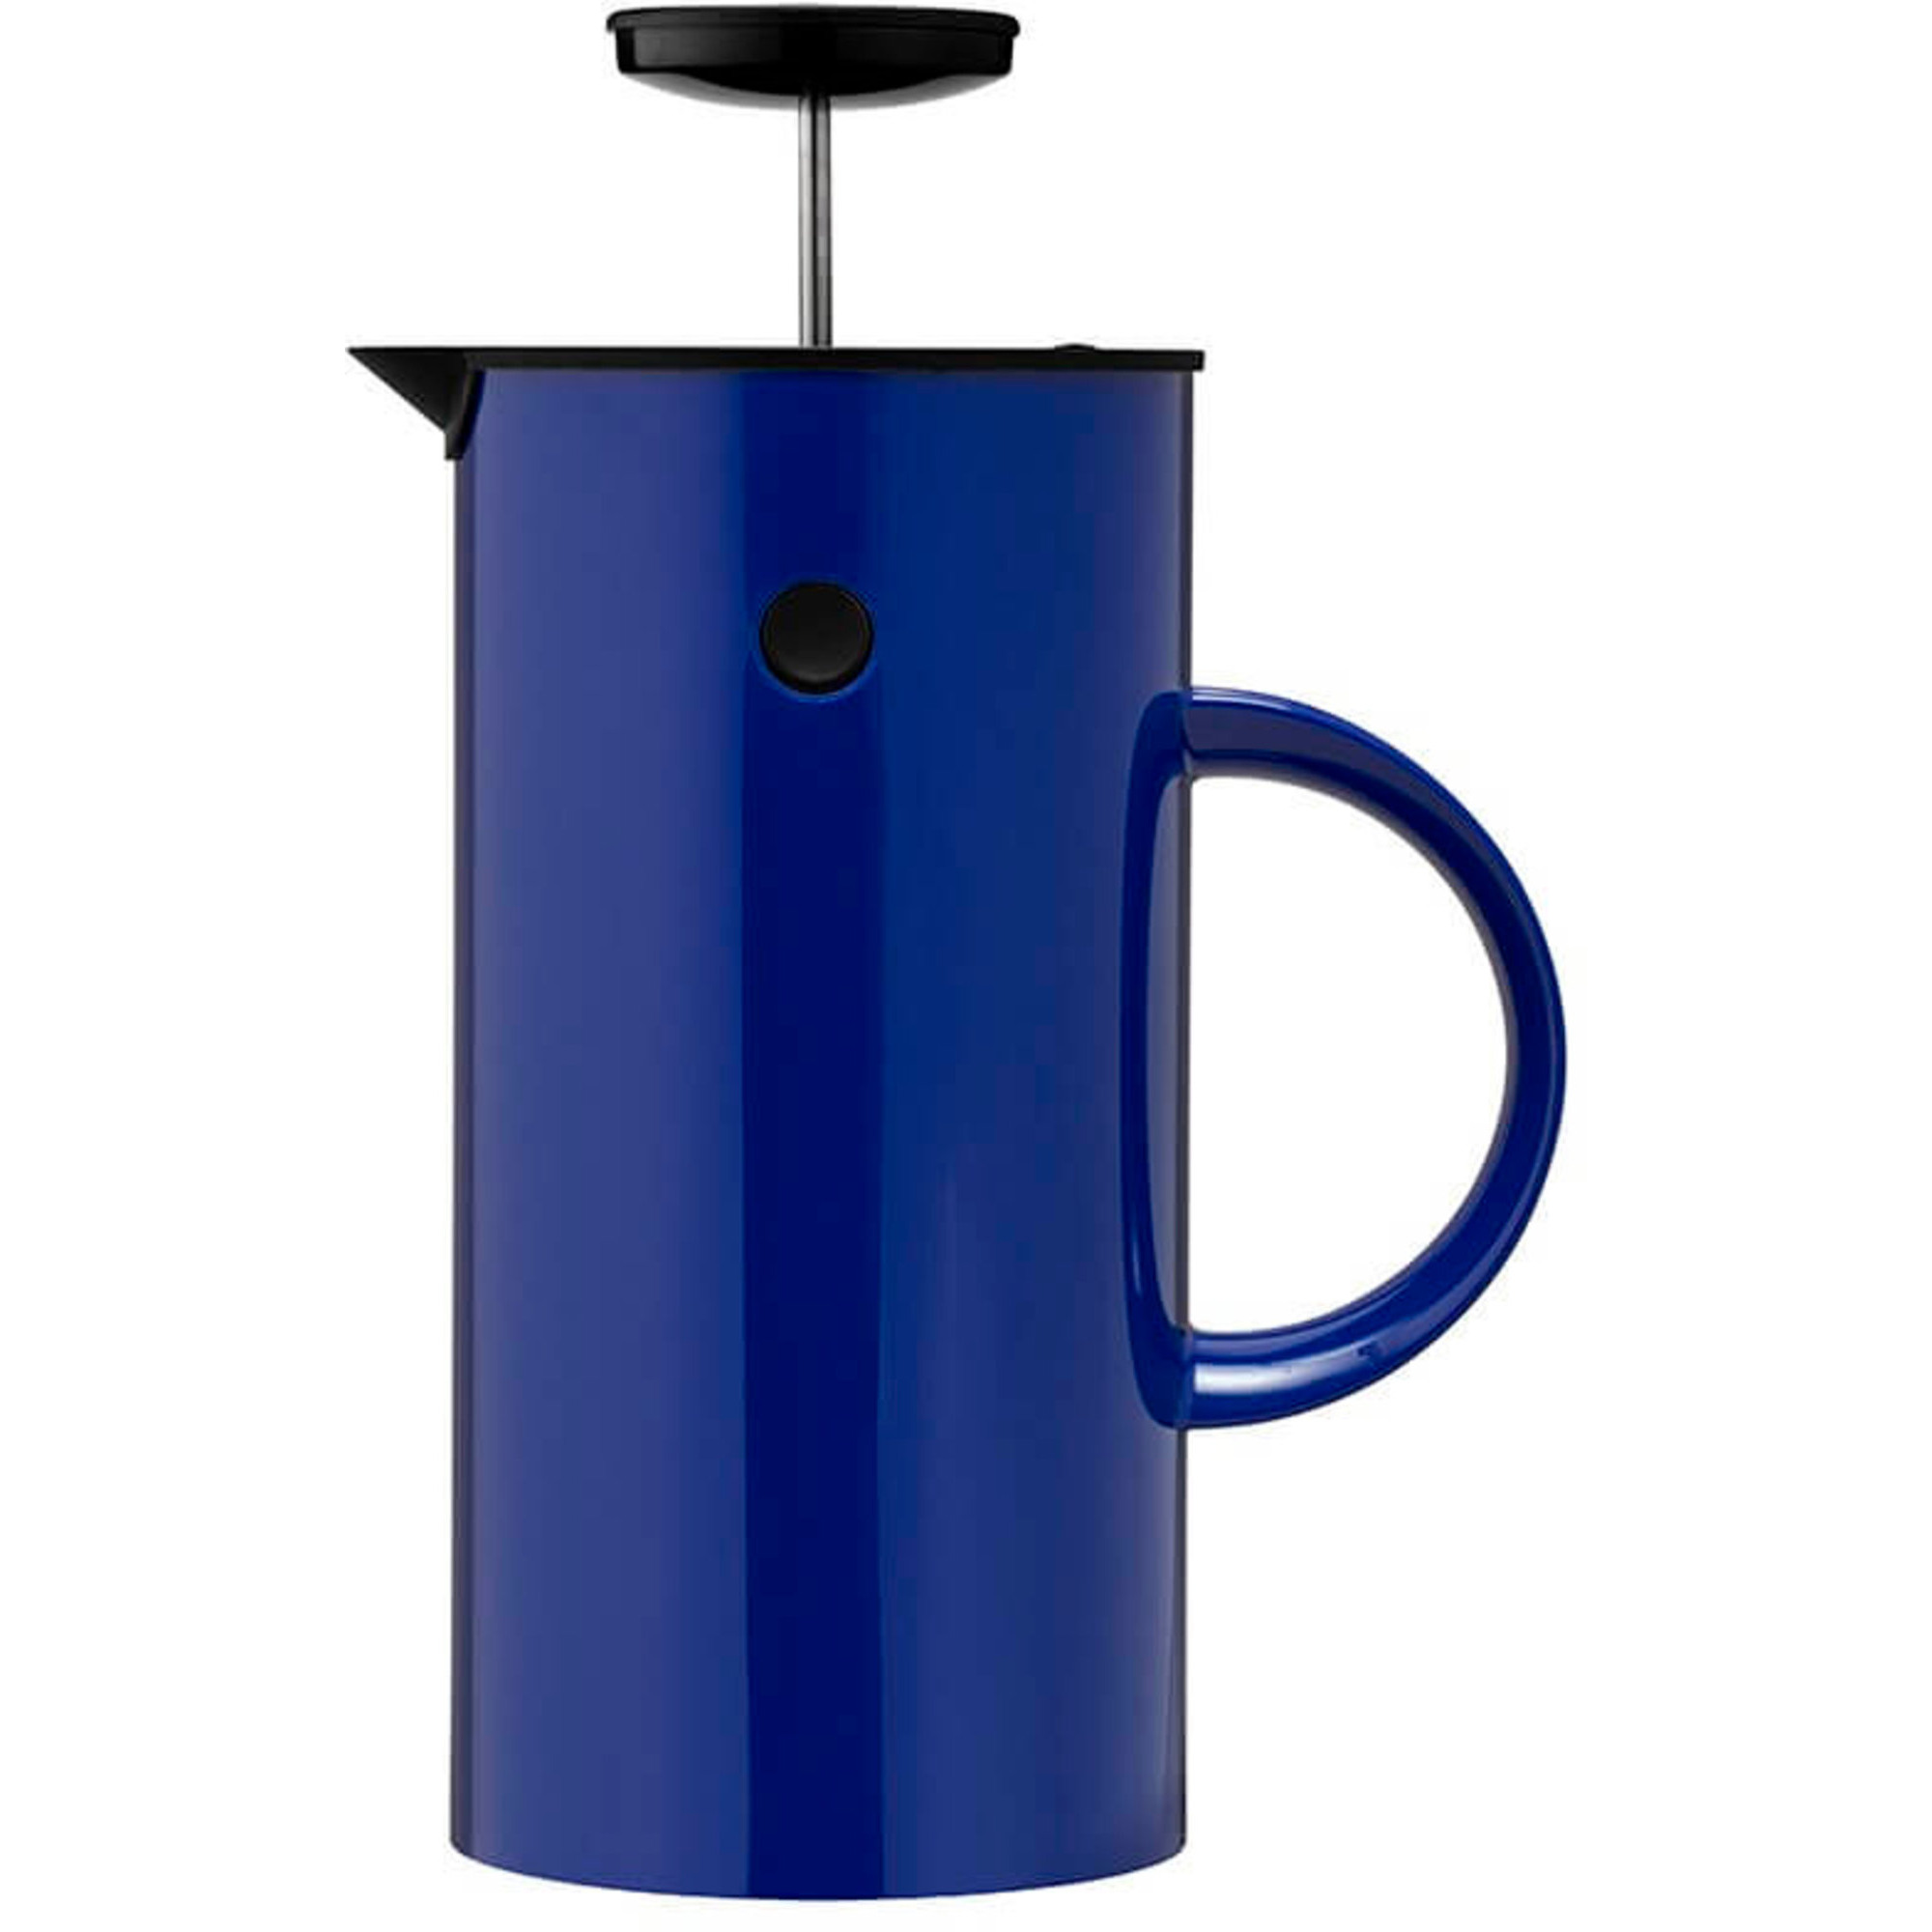 Stelton EM Presskanna Te 1 liter Ultramarine